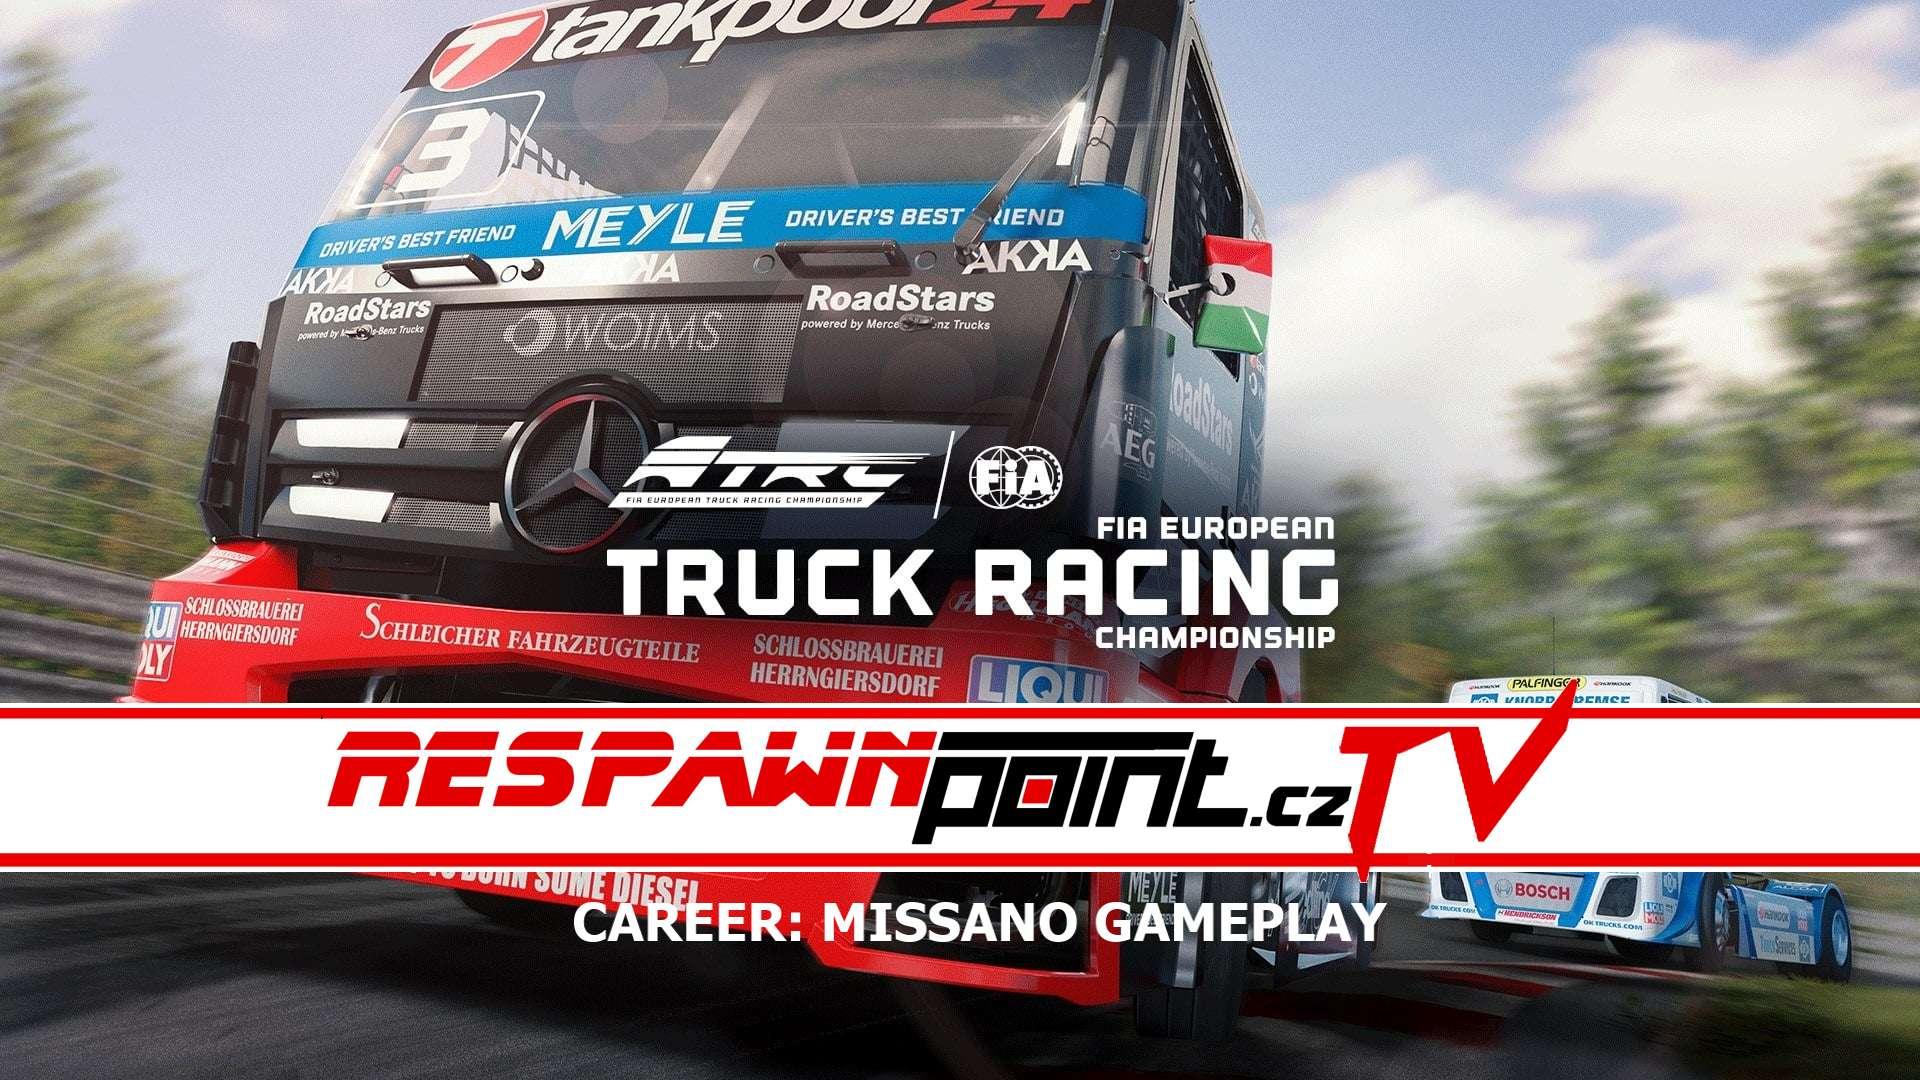 FIA European Truck Racing Championship – Career Missano Gameplay